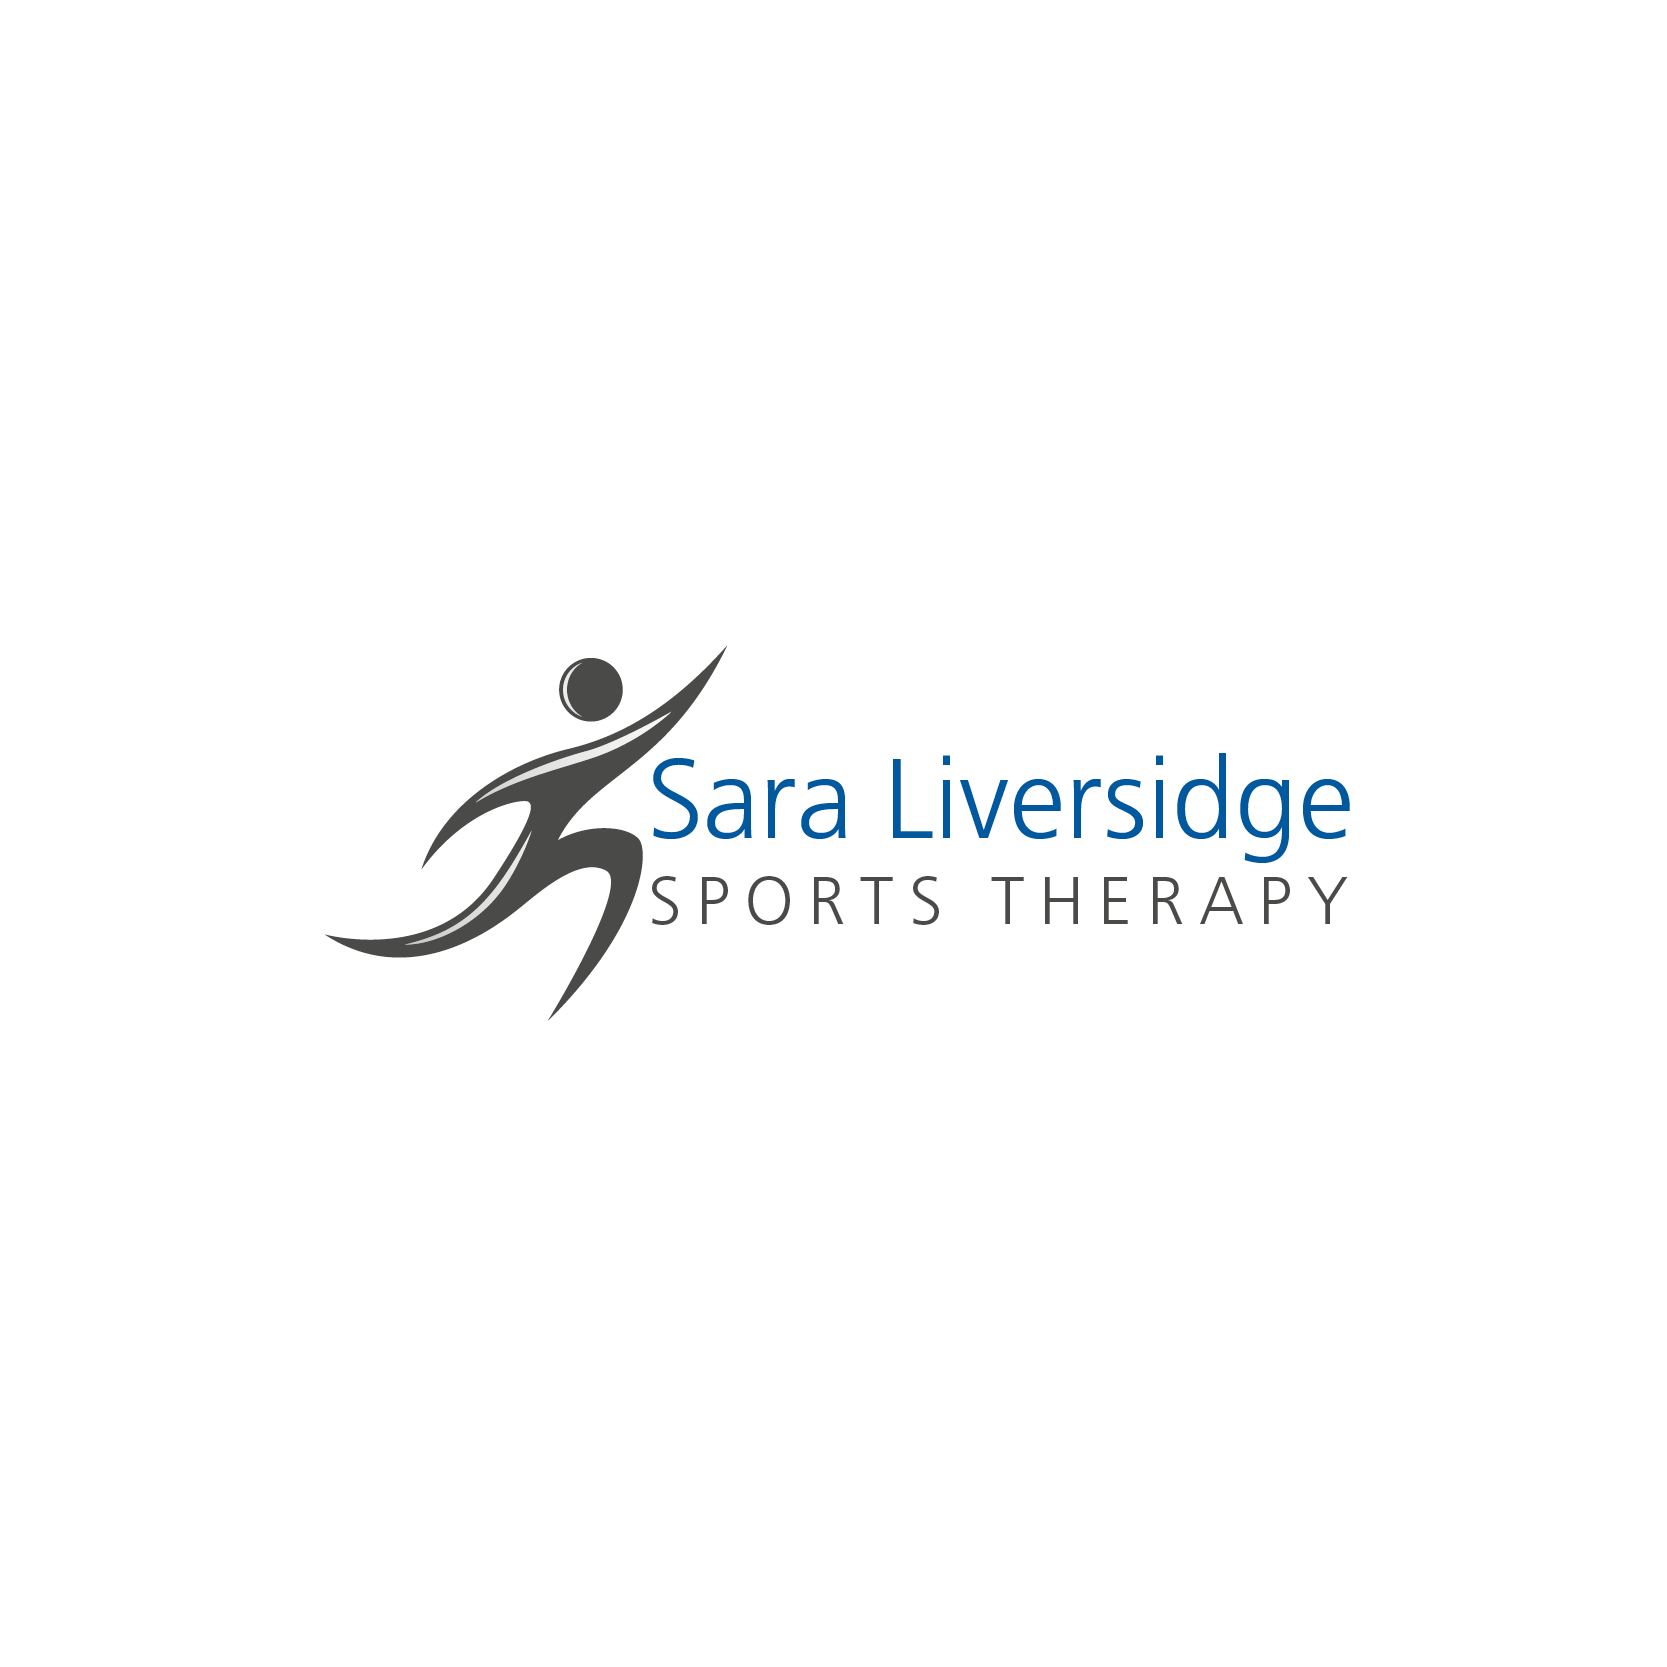 Sara Liversidge